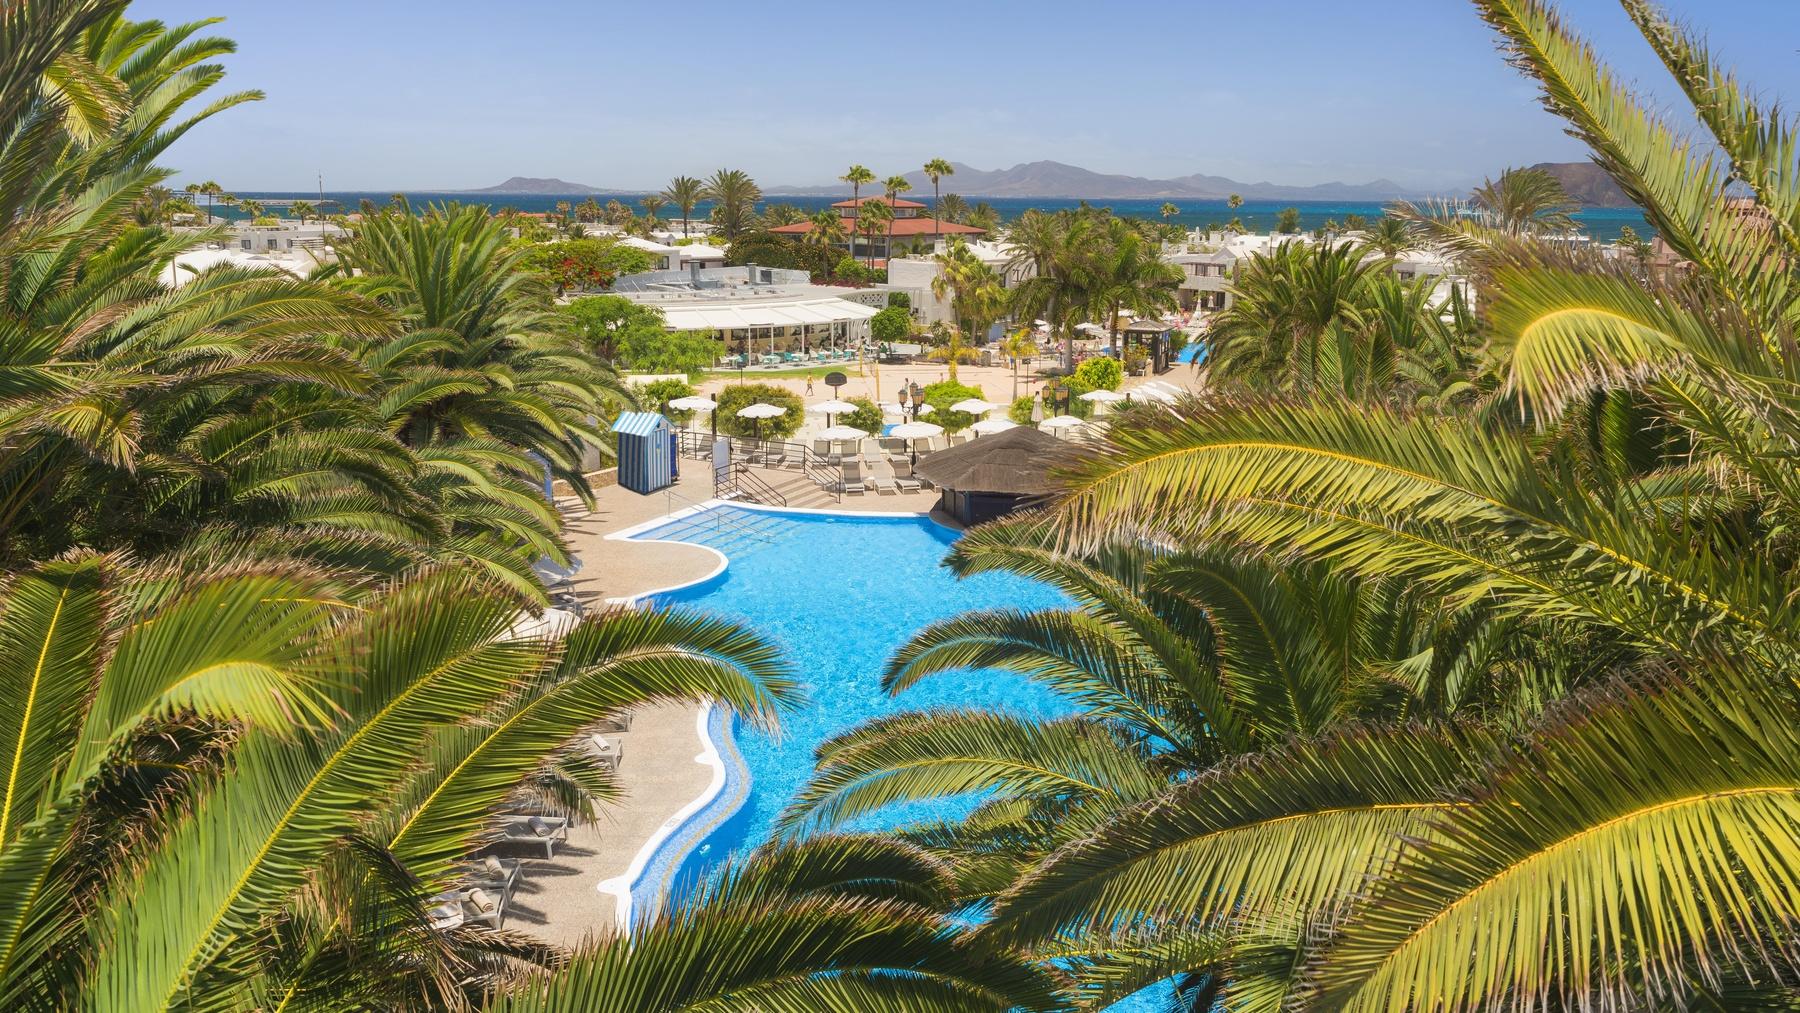 Relax Pool | Hotel Corralejo - Fuerteventura